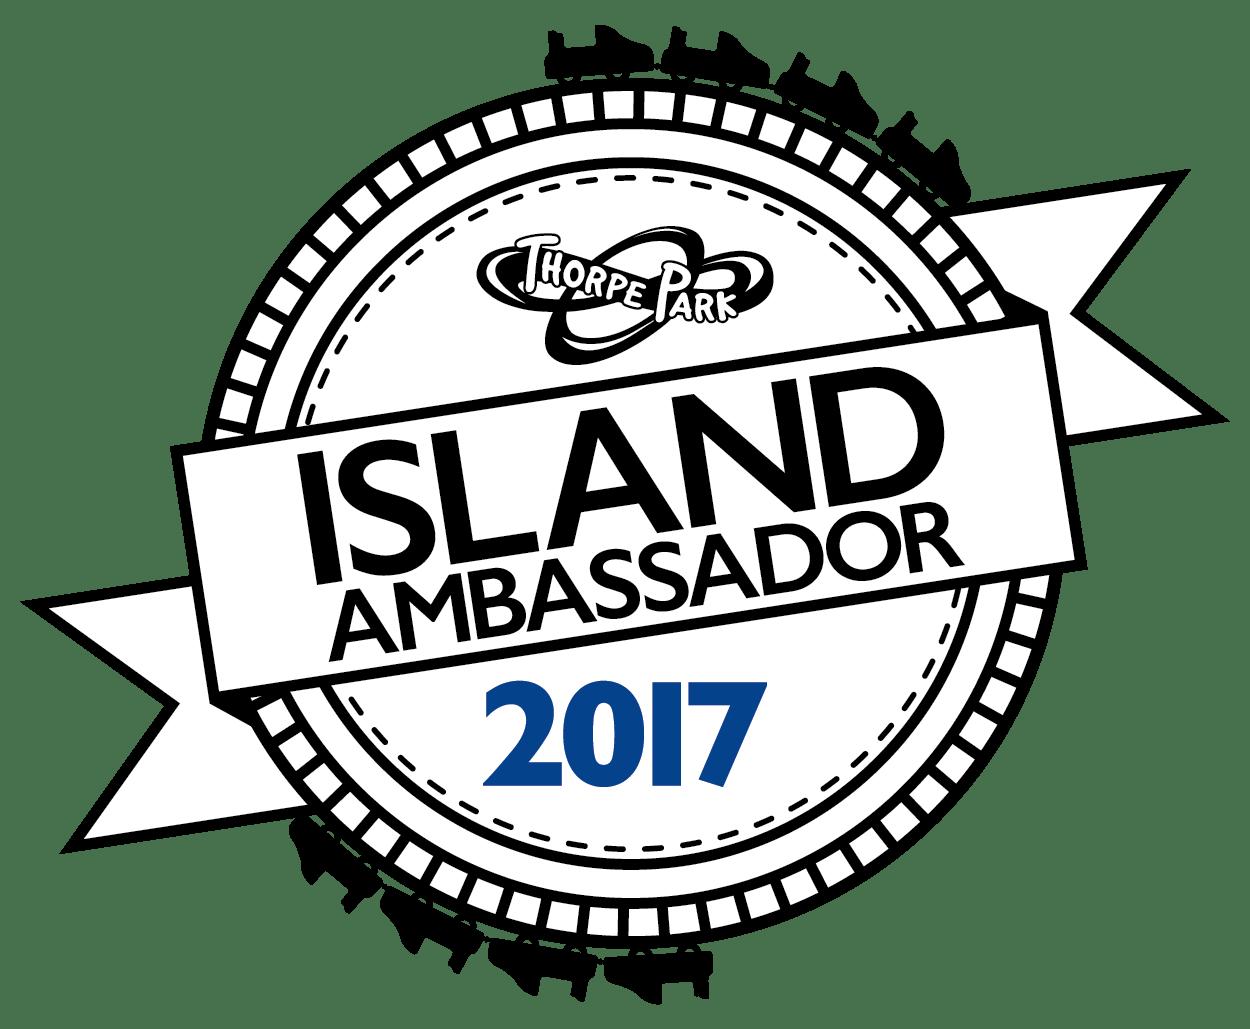 TP16-573 - ISLAND AMBASSADOR BADGE-01